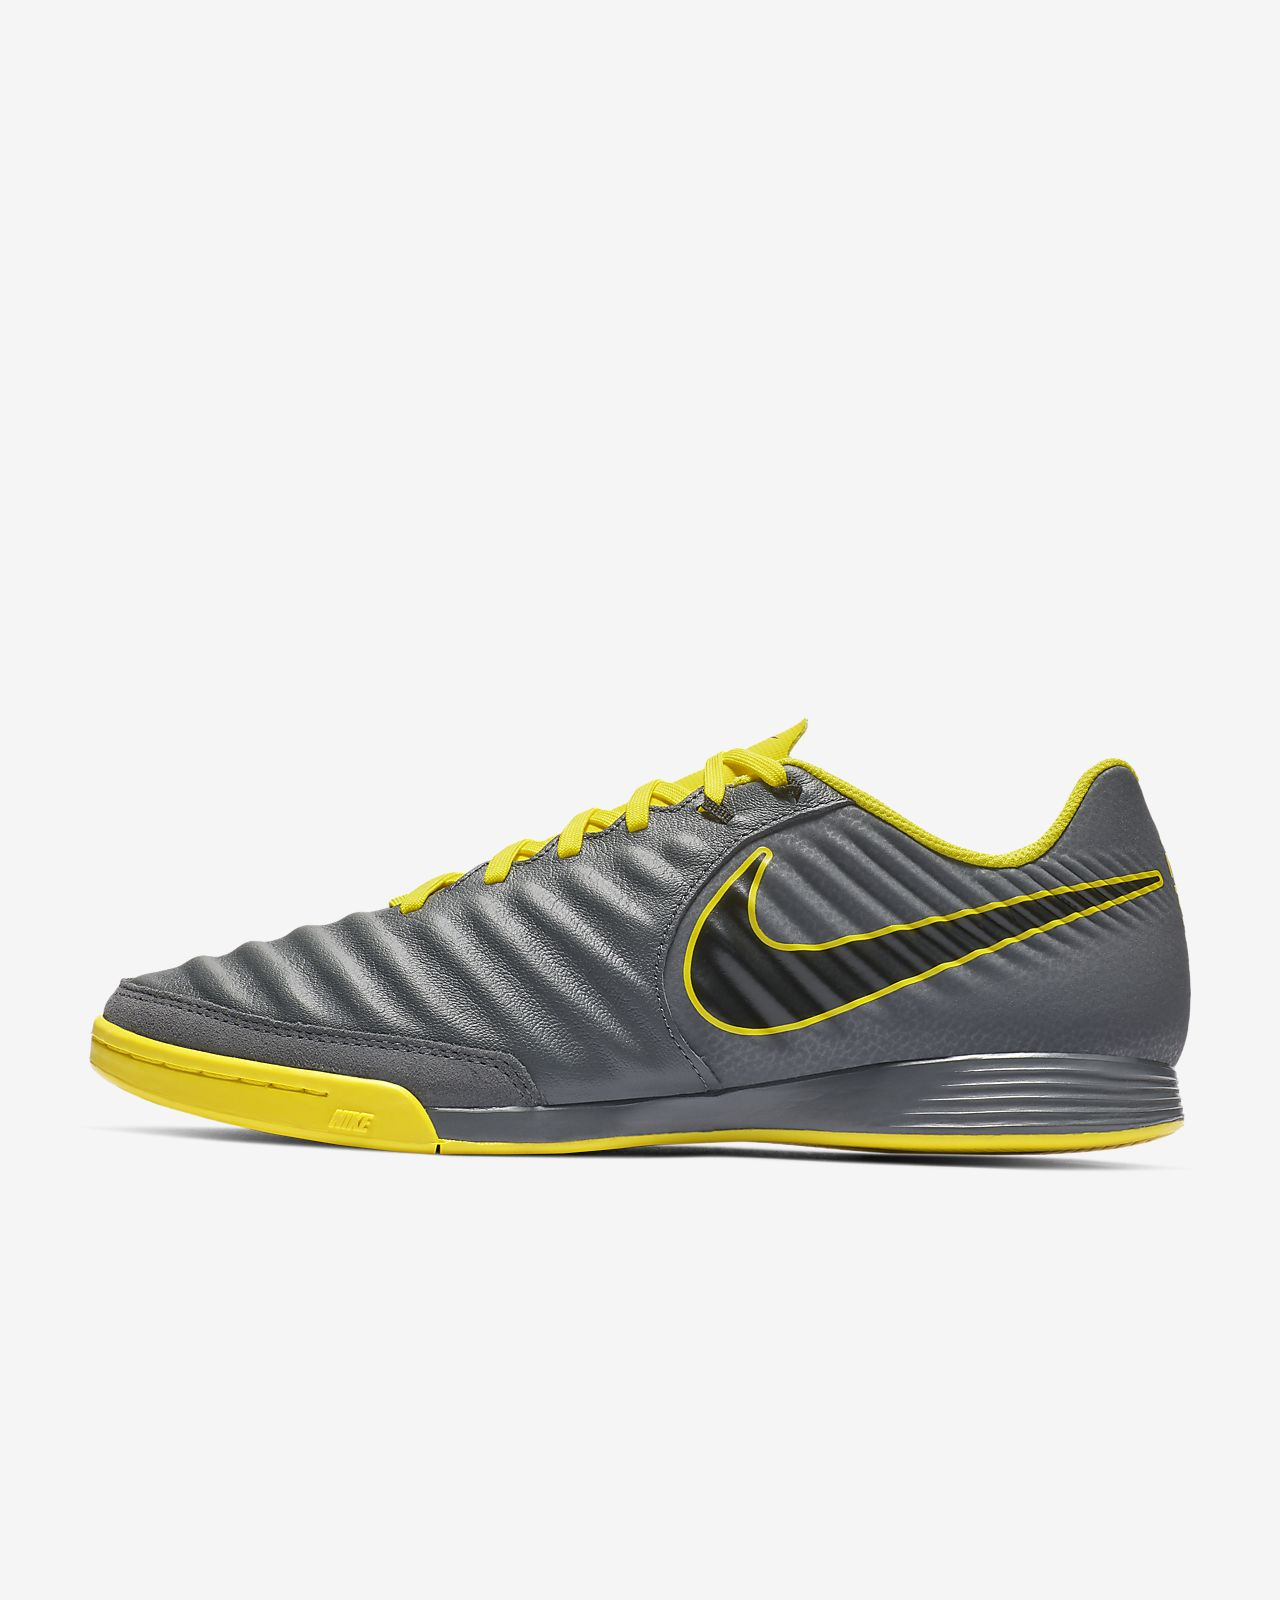 Fotbollssko för inomhusplan/futsal/street Nike LegendX 7 Academy IC